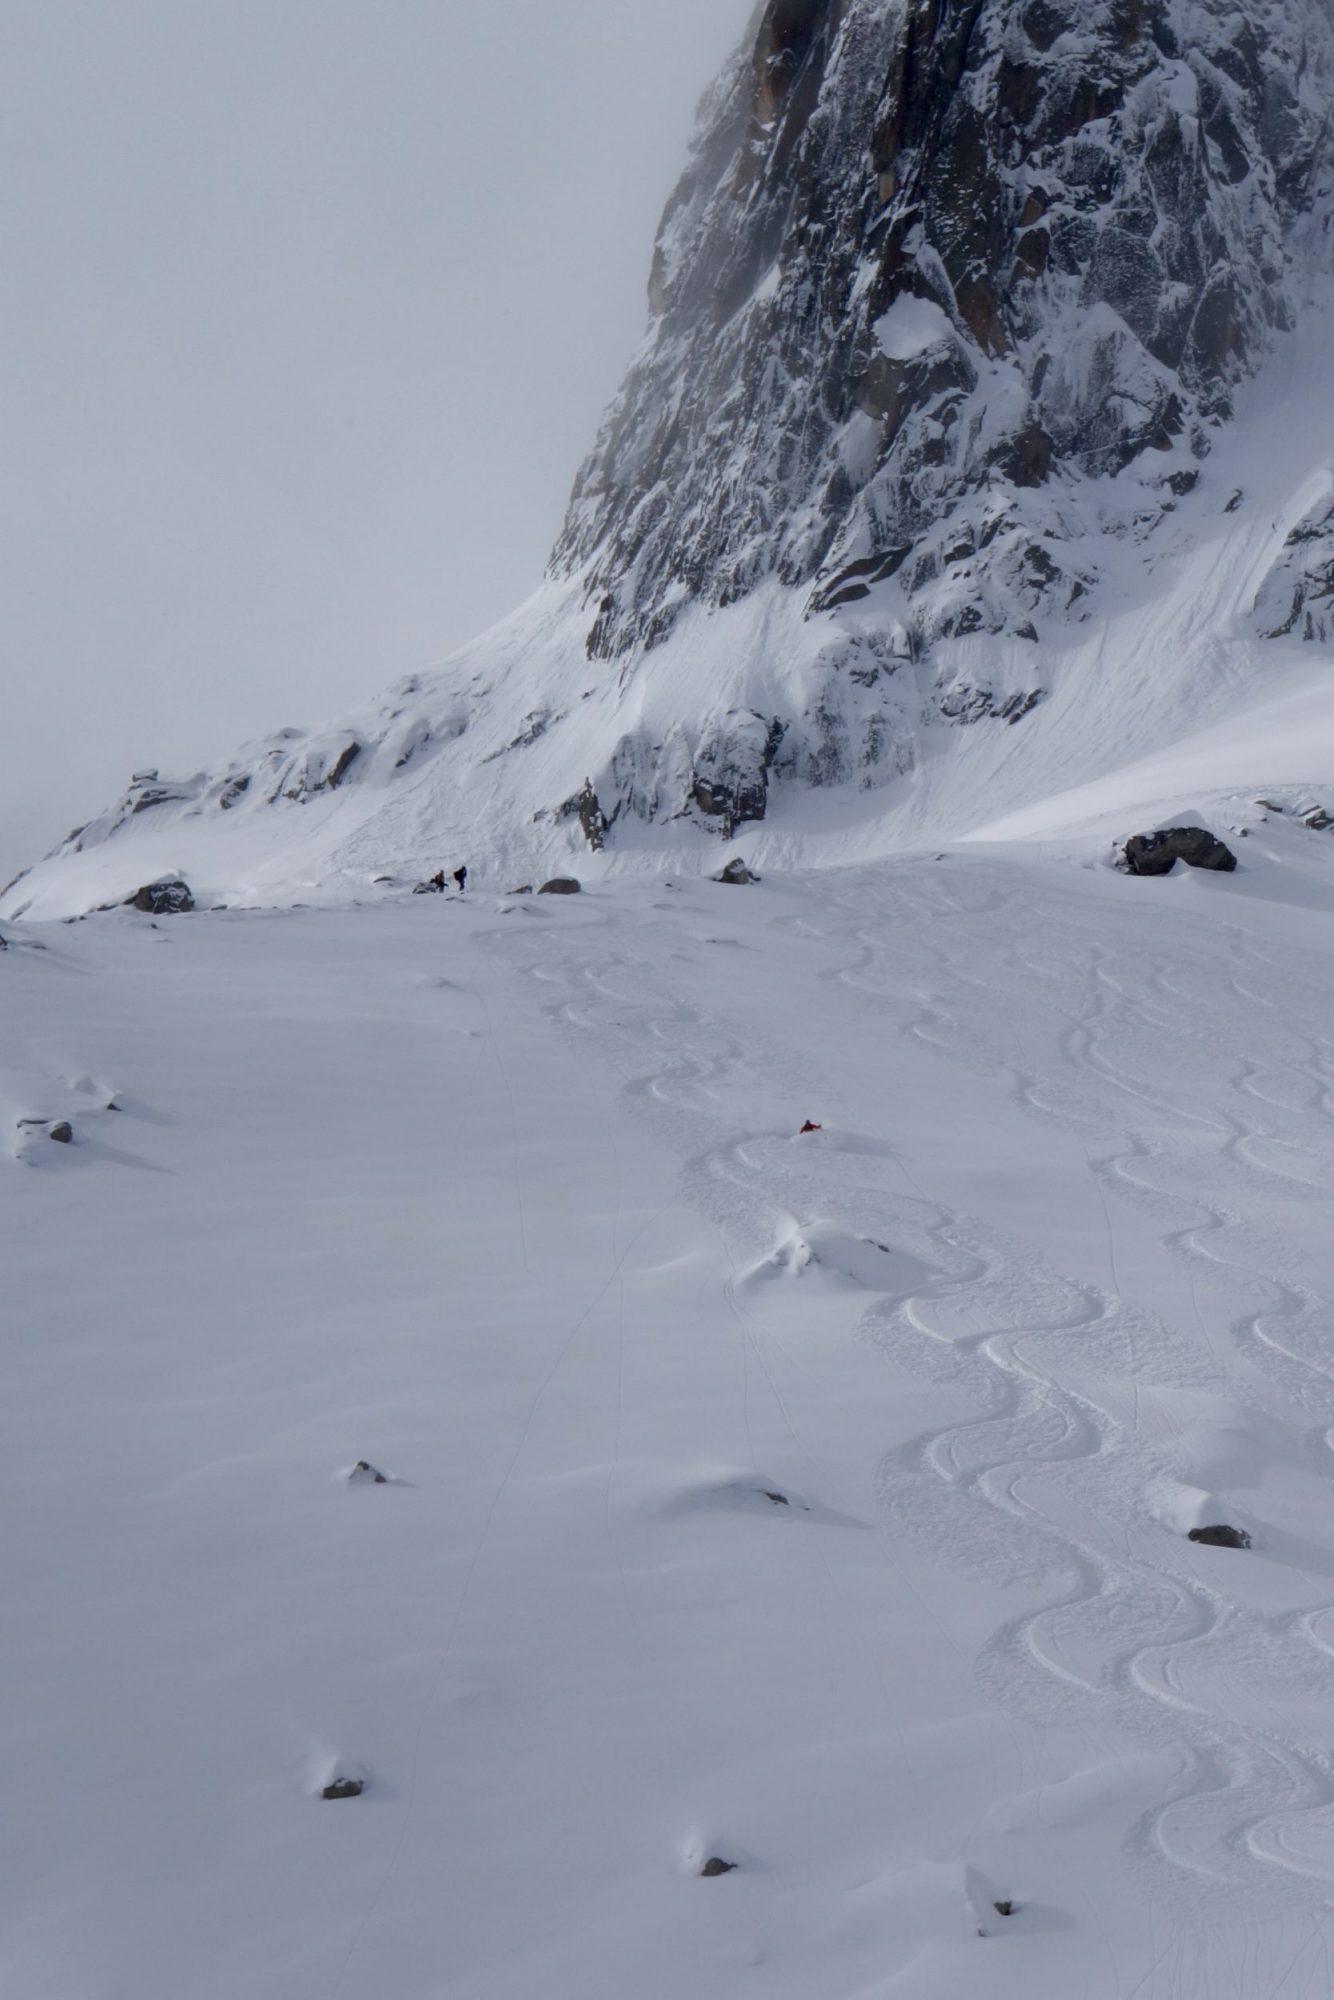 Grand Envers, Vallée Blanche, Ski touring, freeride, off-piste, backcountry, Alpine Energy Guiding, mountaineering & ski adventures, Andrew Lanham Mountain Guide, Chamonix, Aosta Valley, Swiss, lyngen alps